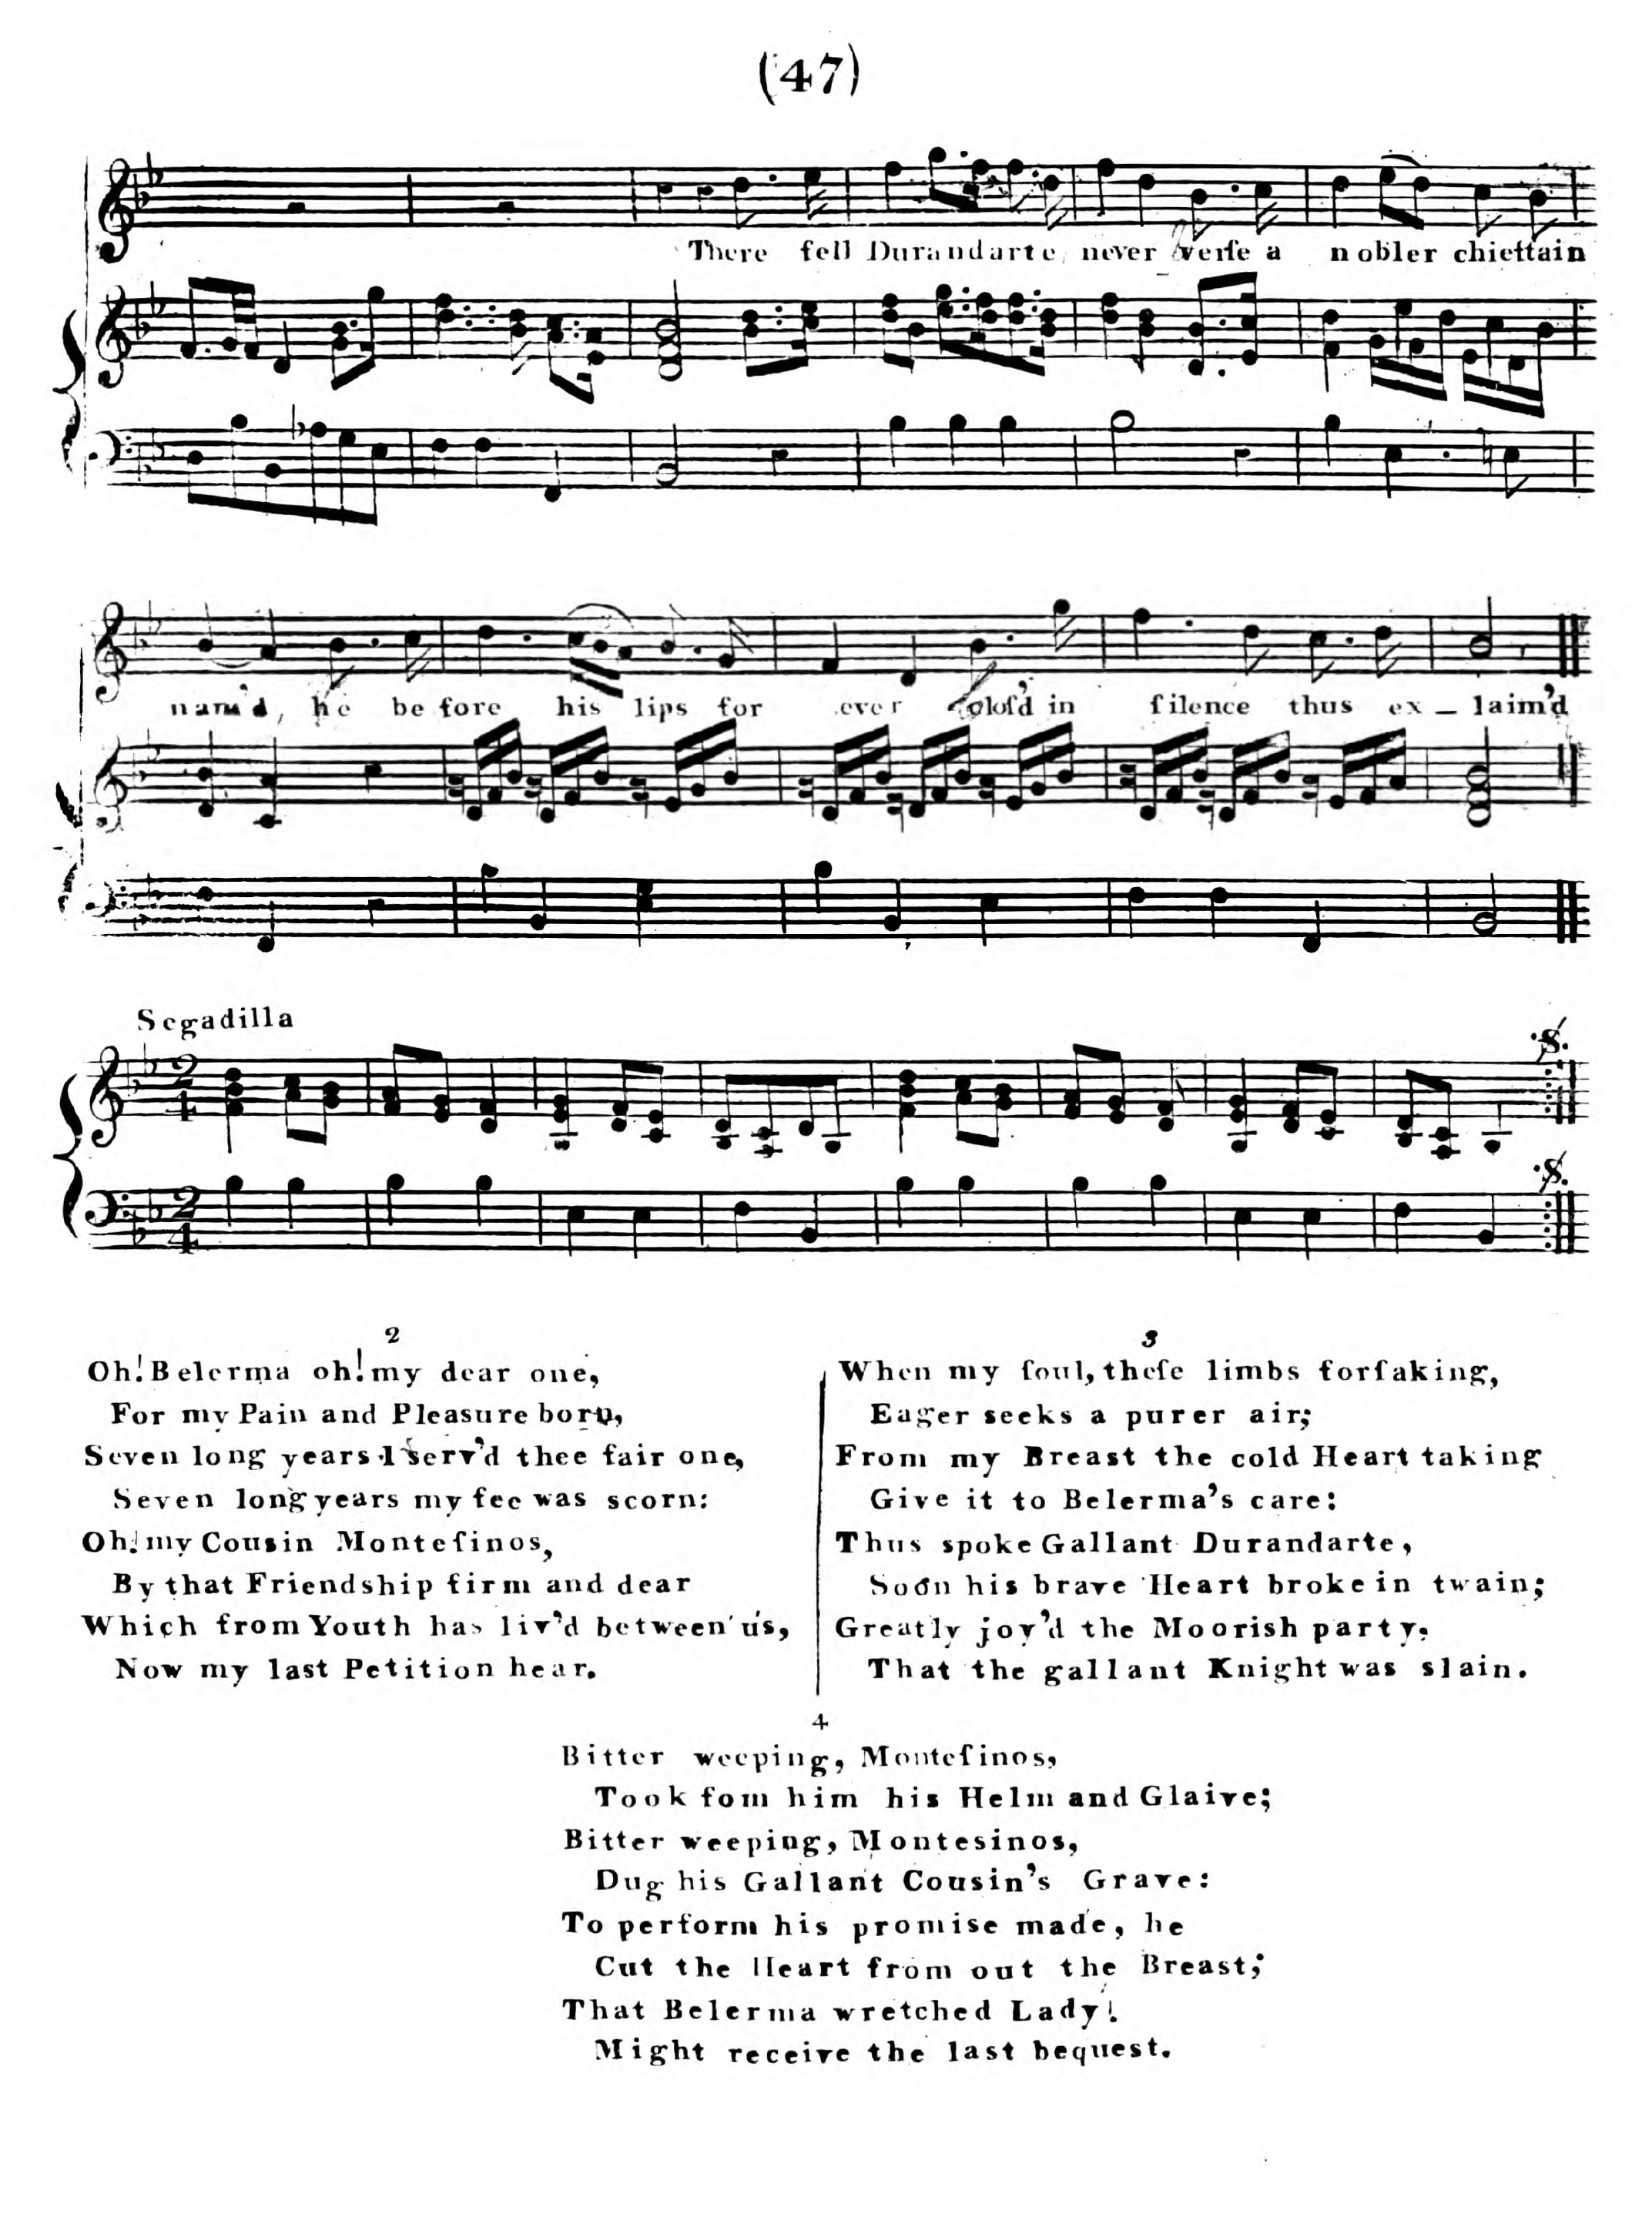 Durandarte-Carr-MusicalJournal-no63b.jpg